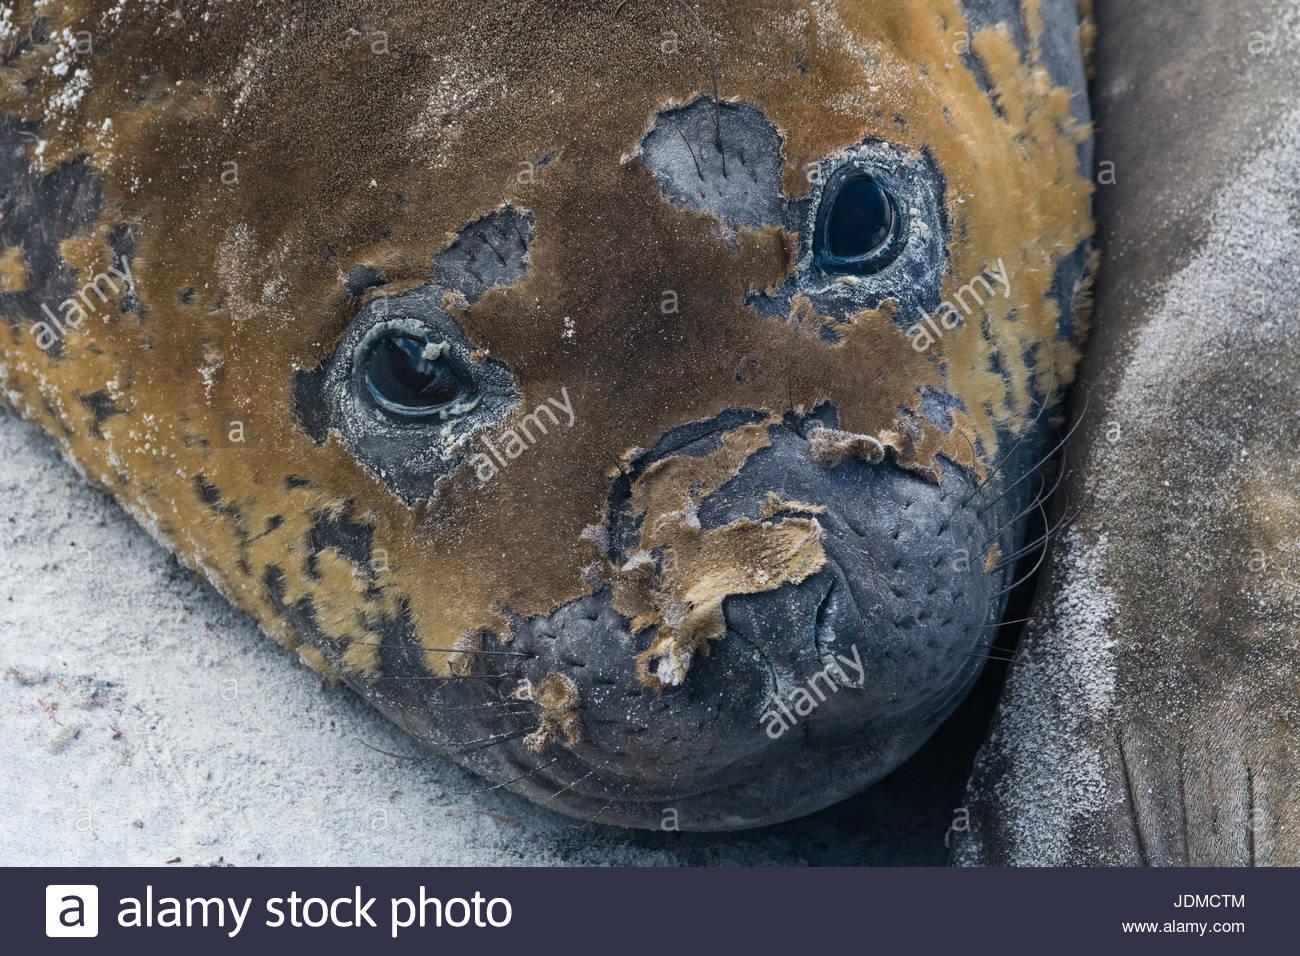 A southern elephant seal molting, Mirounga leonina, looks into camera. - Stock Image